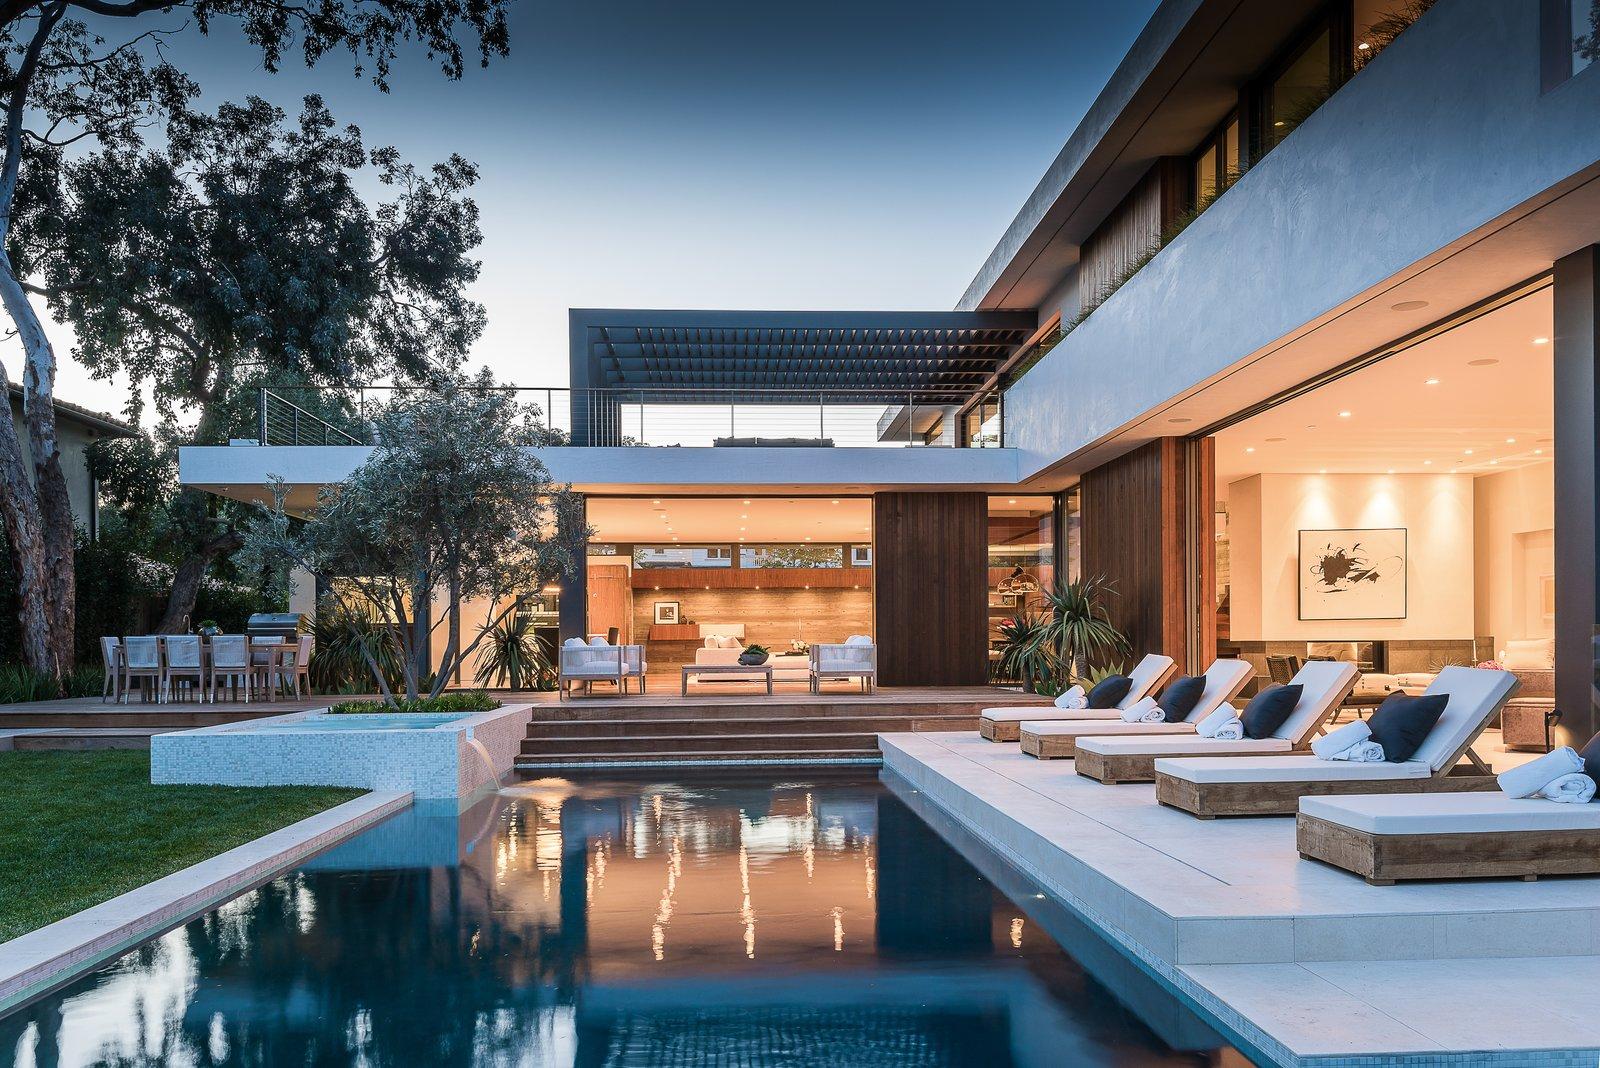 Pool Amalfi Drive Residence by Daryl Olesinski